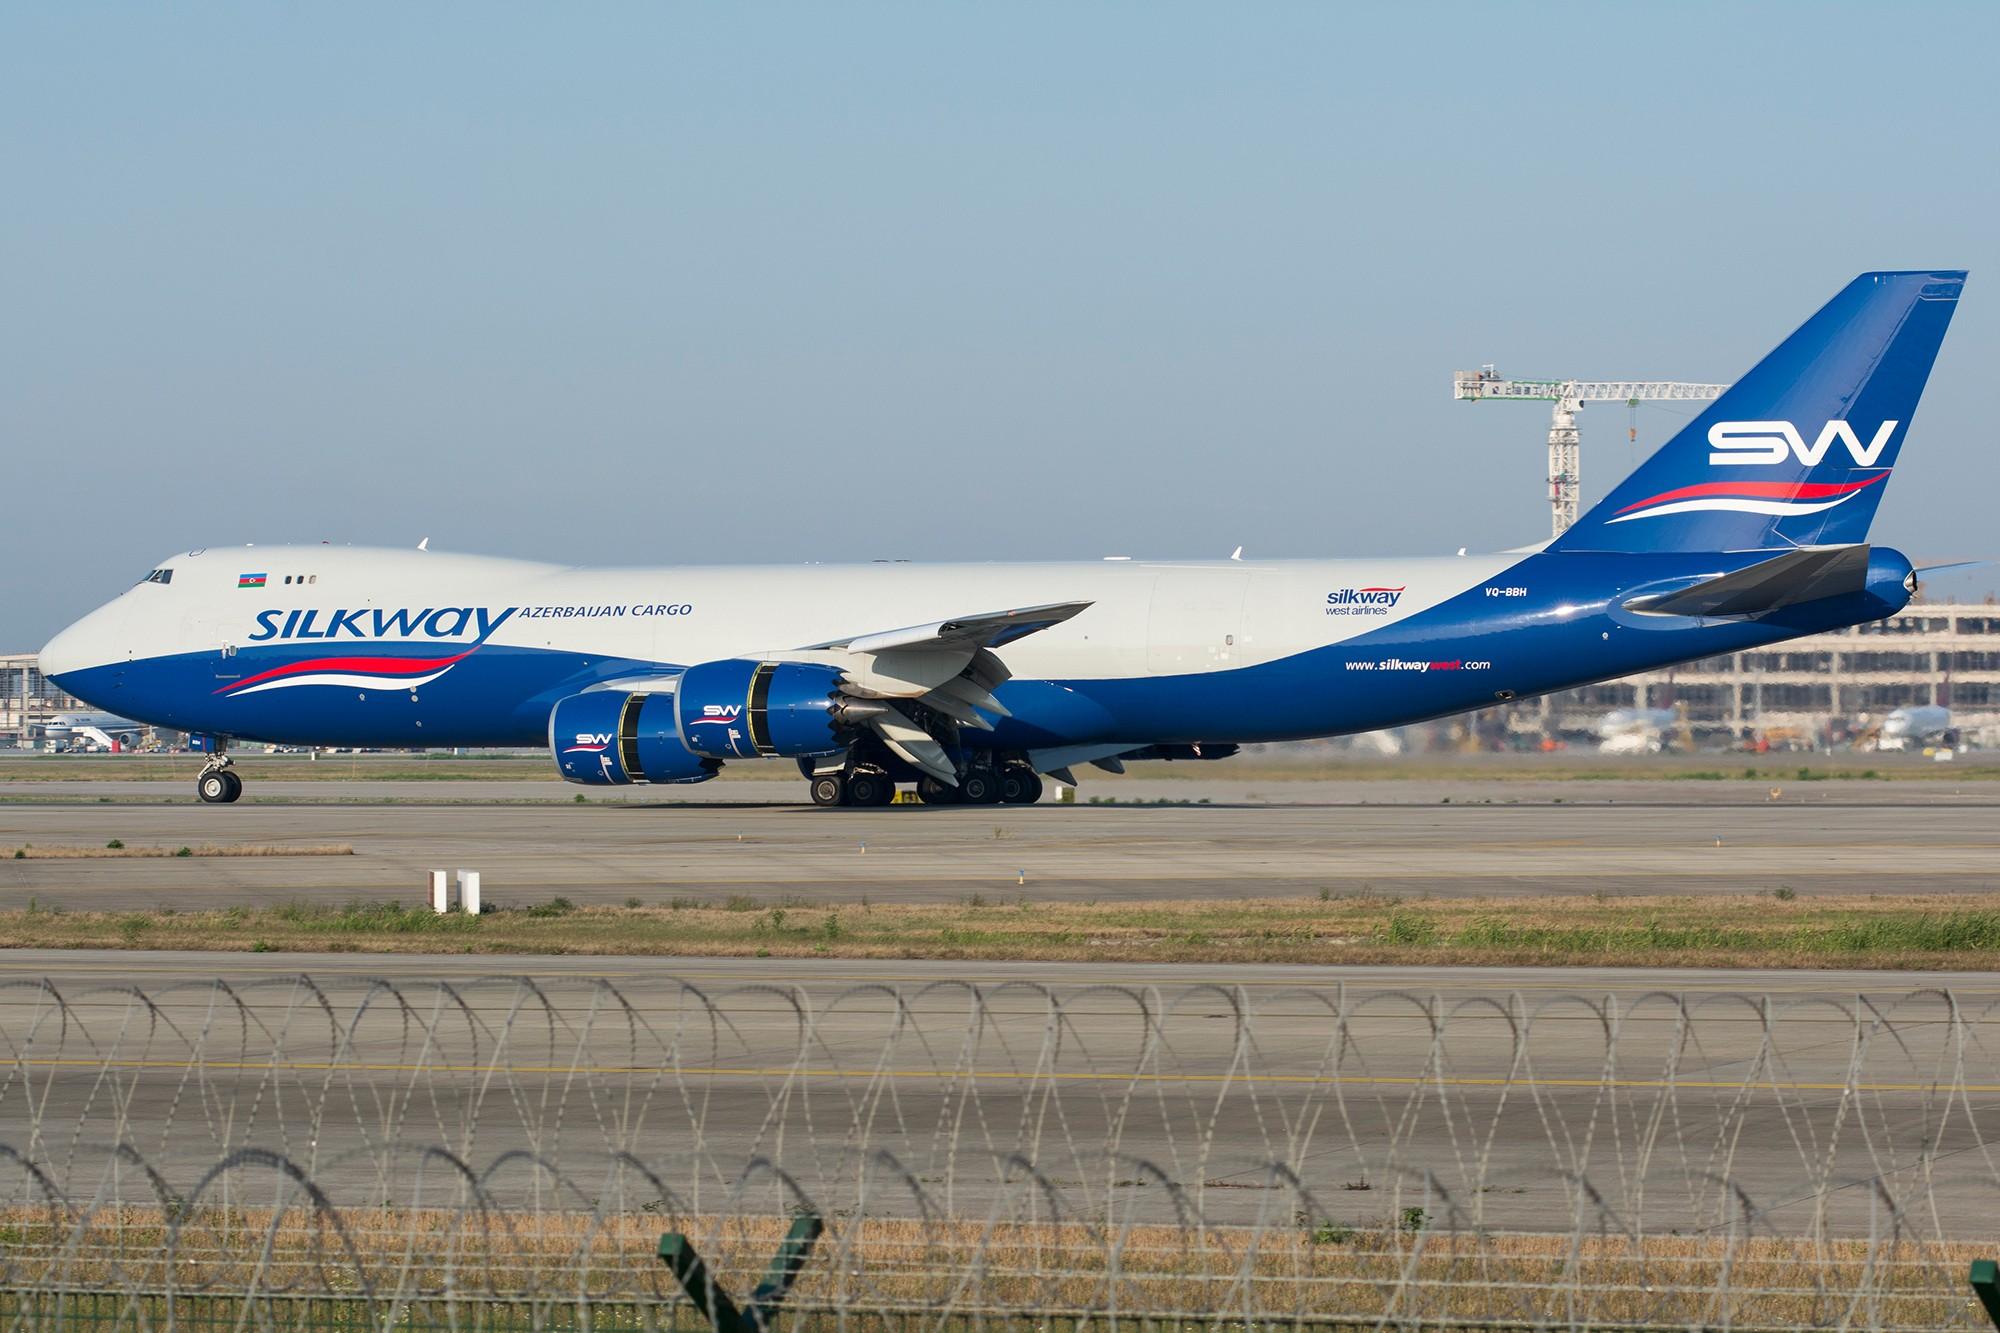 Re:[PVG] 首见丝路航空B748,早起的鸟儿有虫吃! BOEING 747-8F VQ-BBH 中国上海浦东国际机场